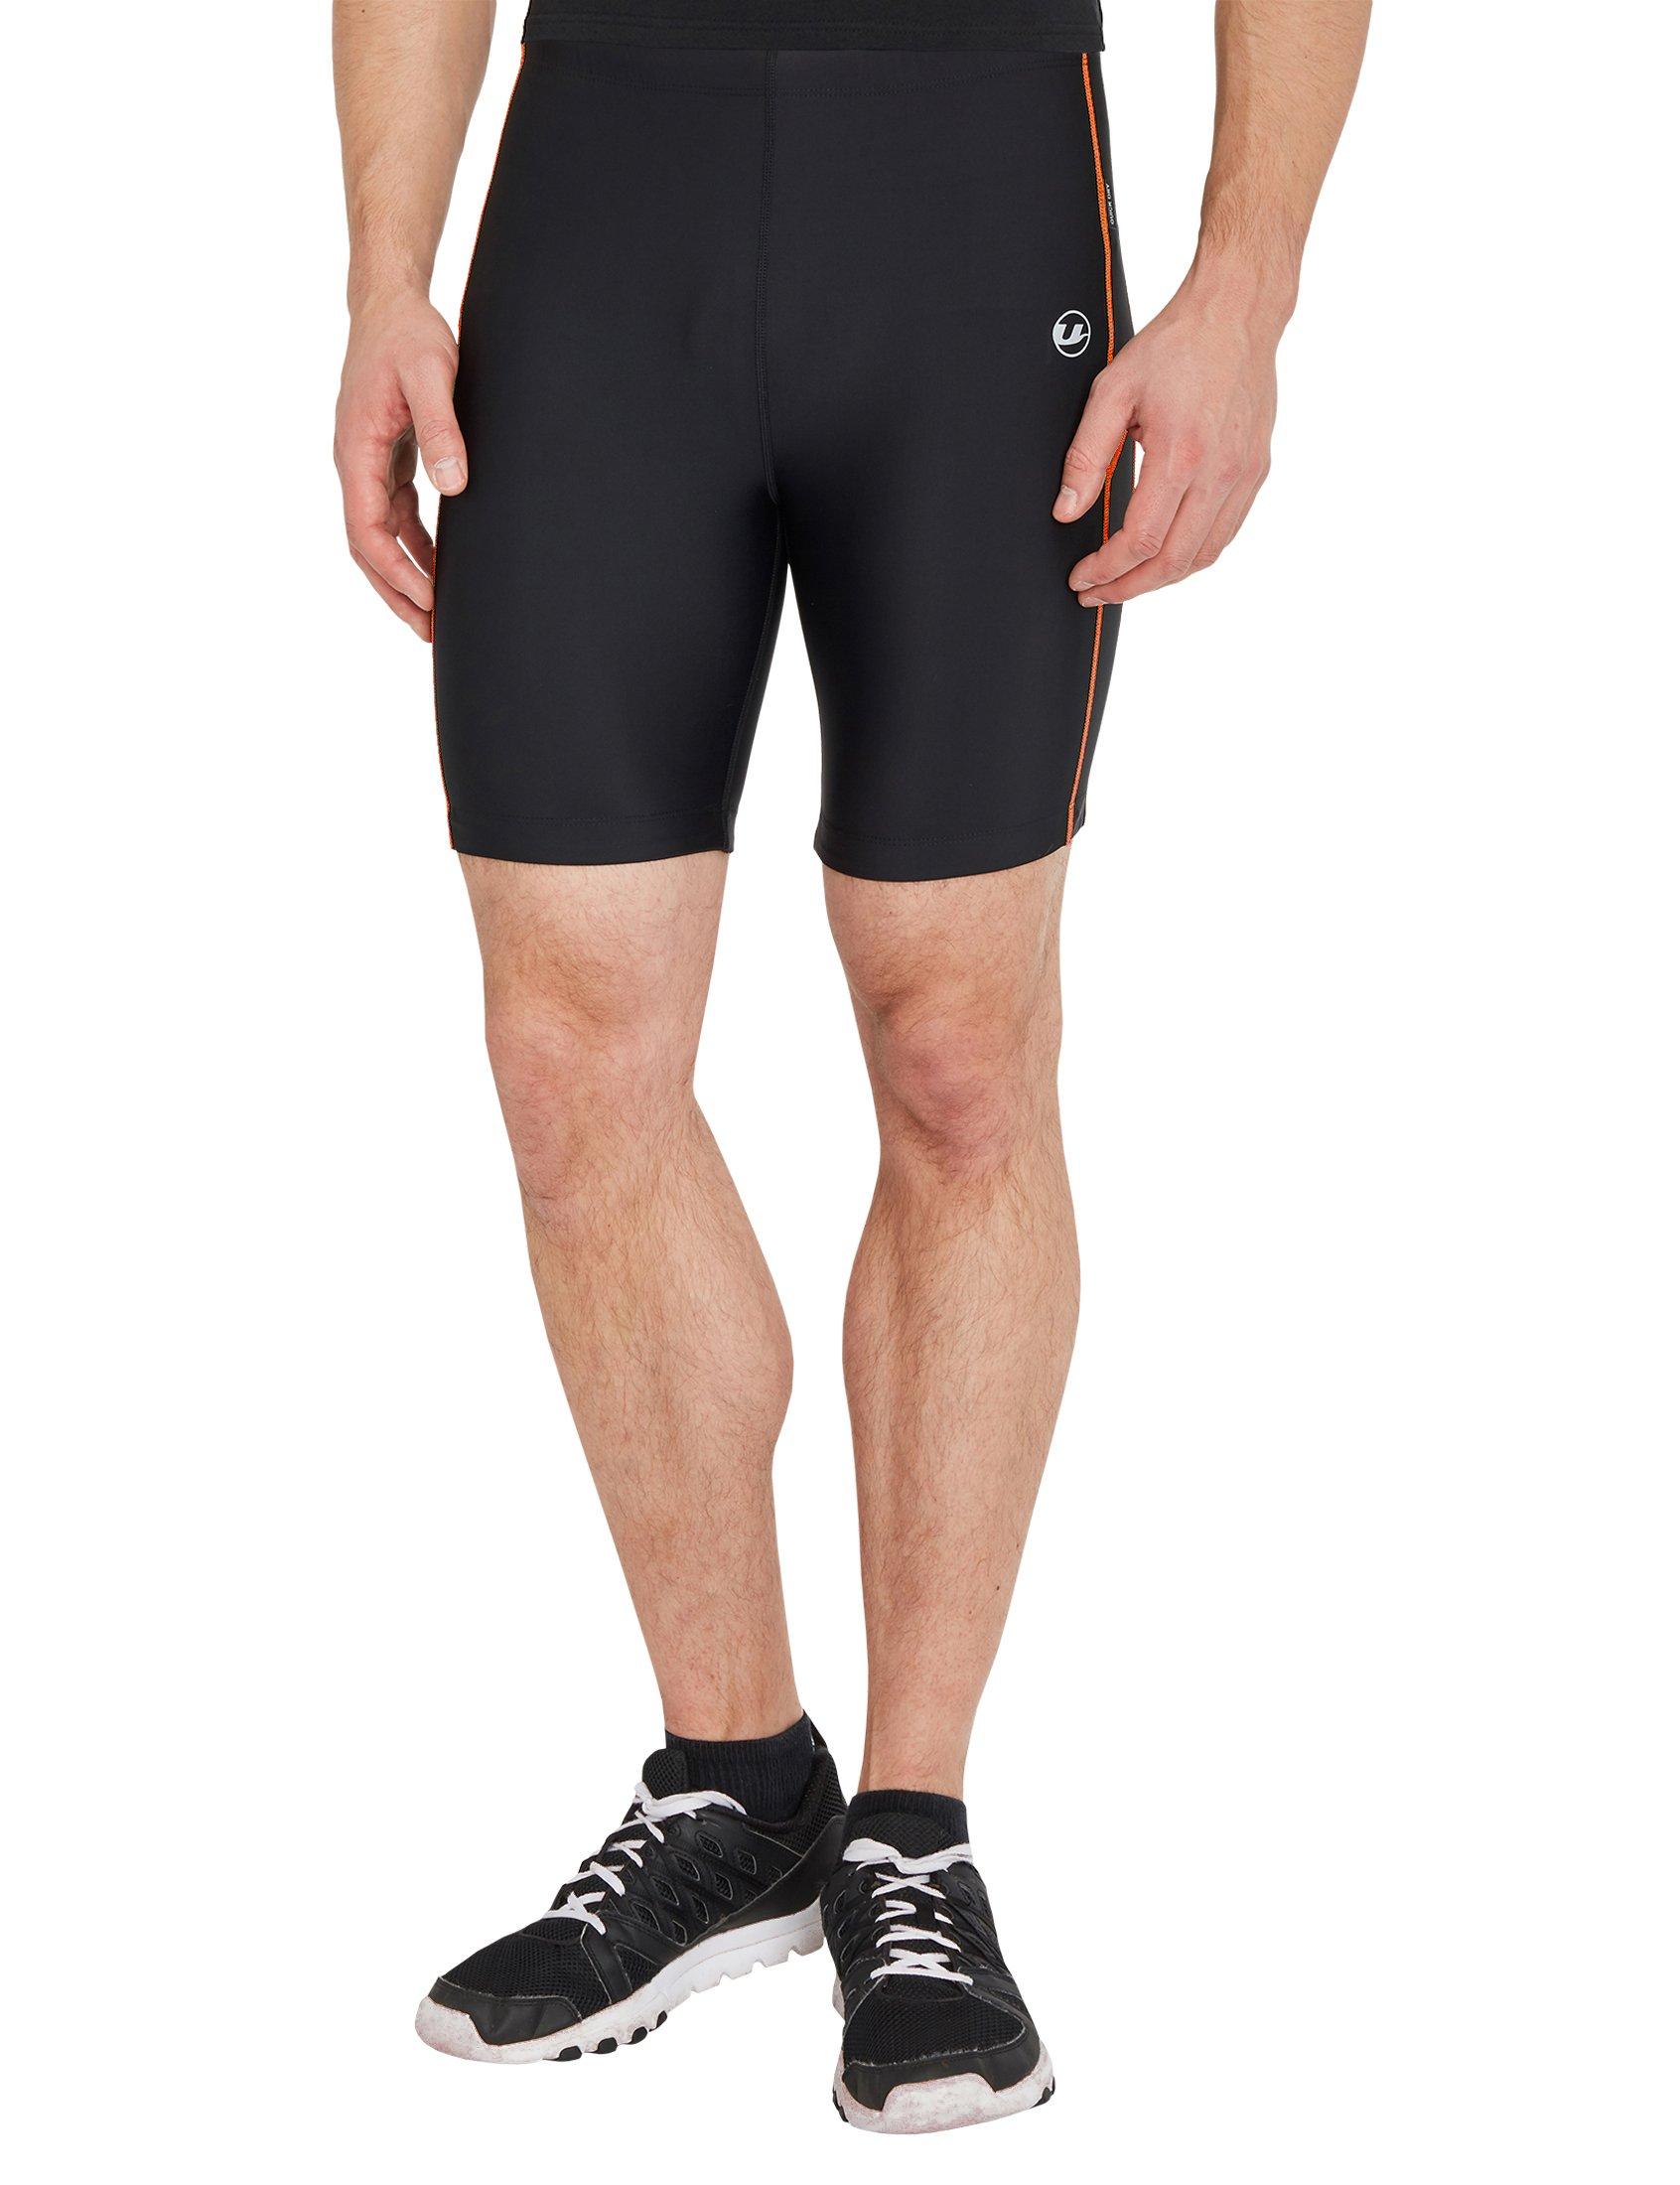 Para Valorados Deportivos Cortos Pantalones Hombre Mejor En XPUqgWaaw